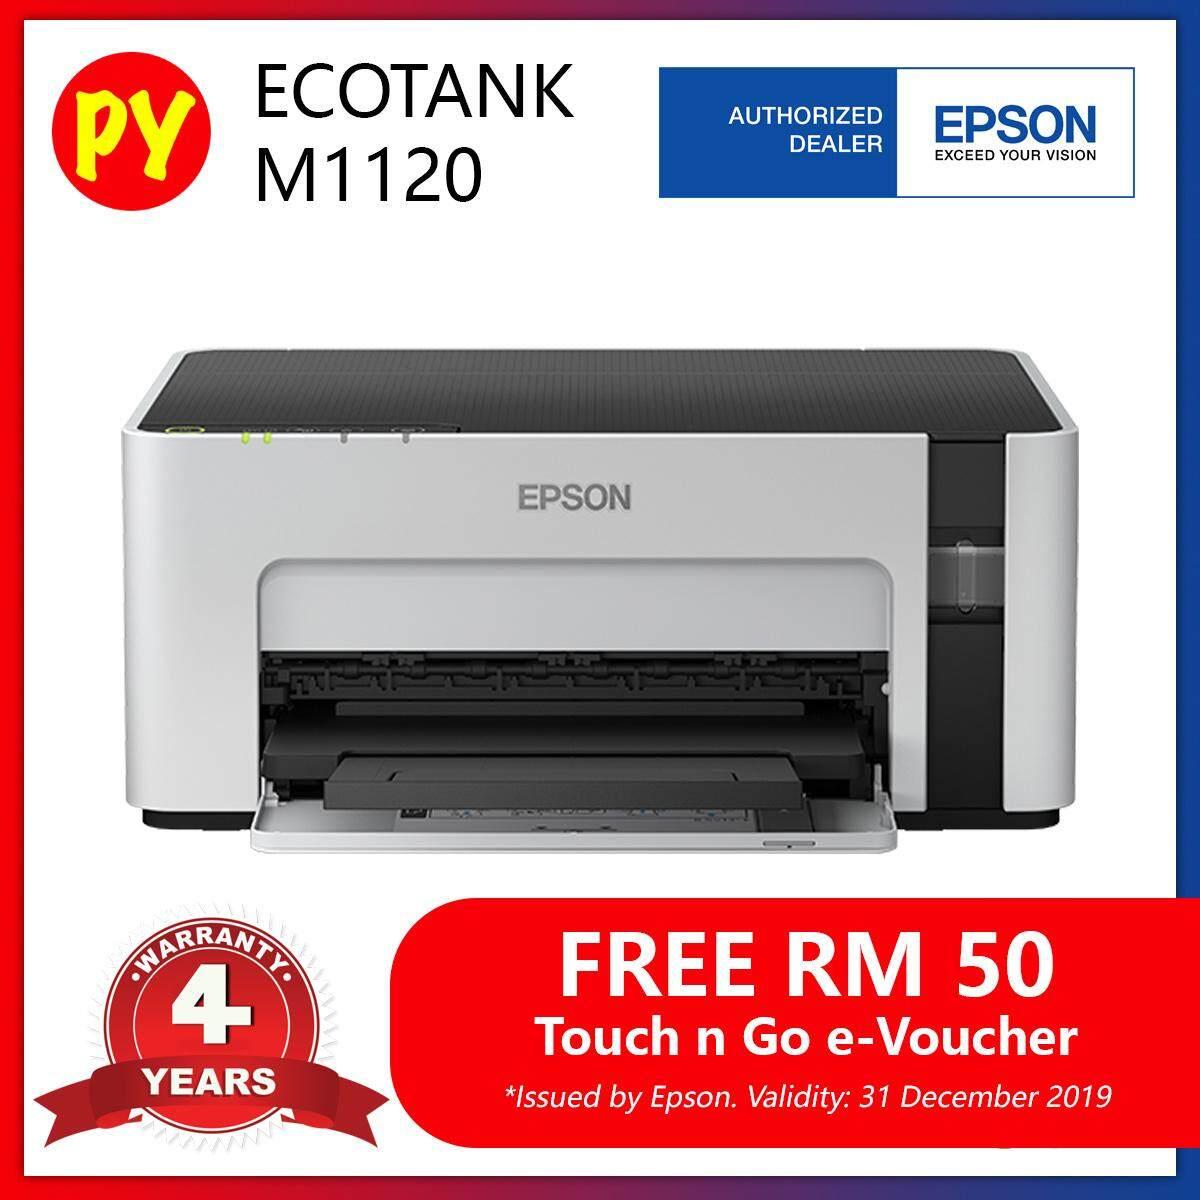 Epson EcoTank Monochrome Single Function M1120 Wi-Fi Ink Tank Printer + Free RM50 Touch 'n Go E-Voucher